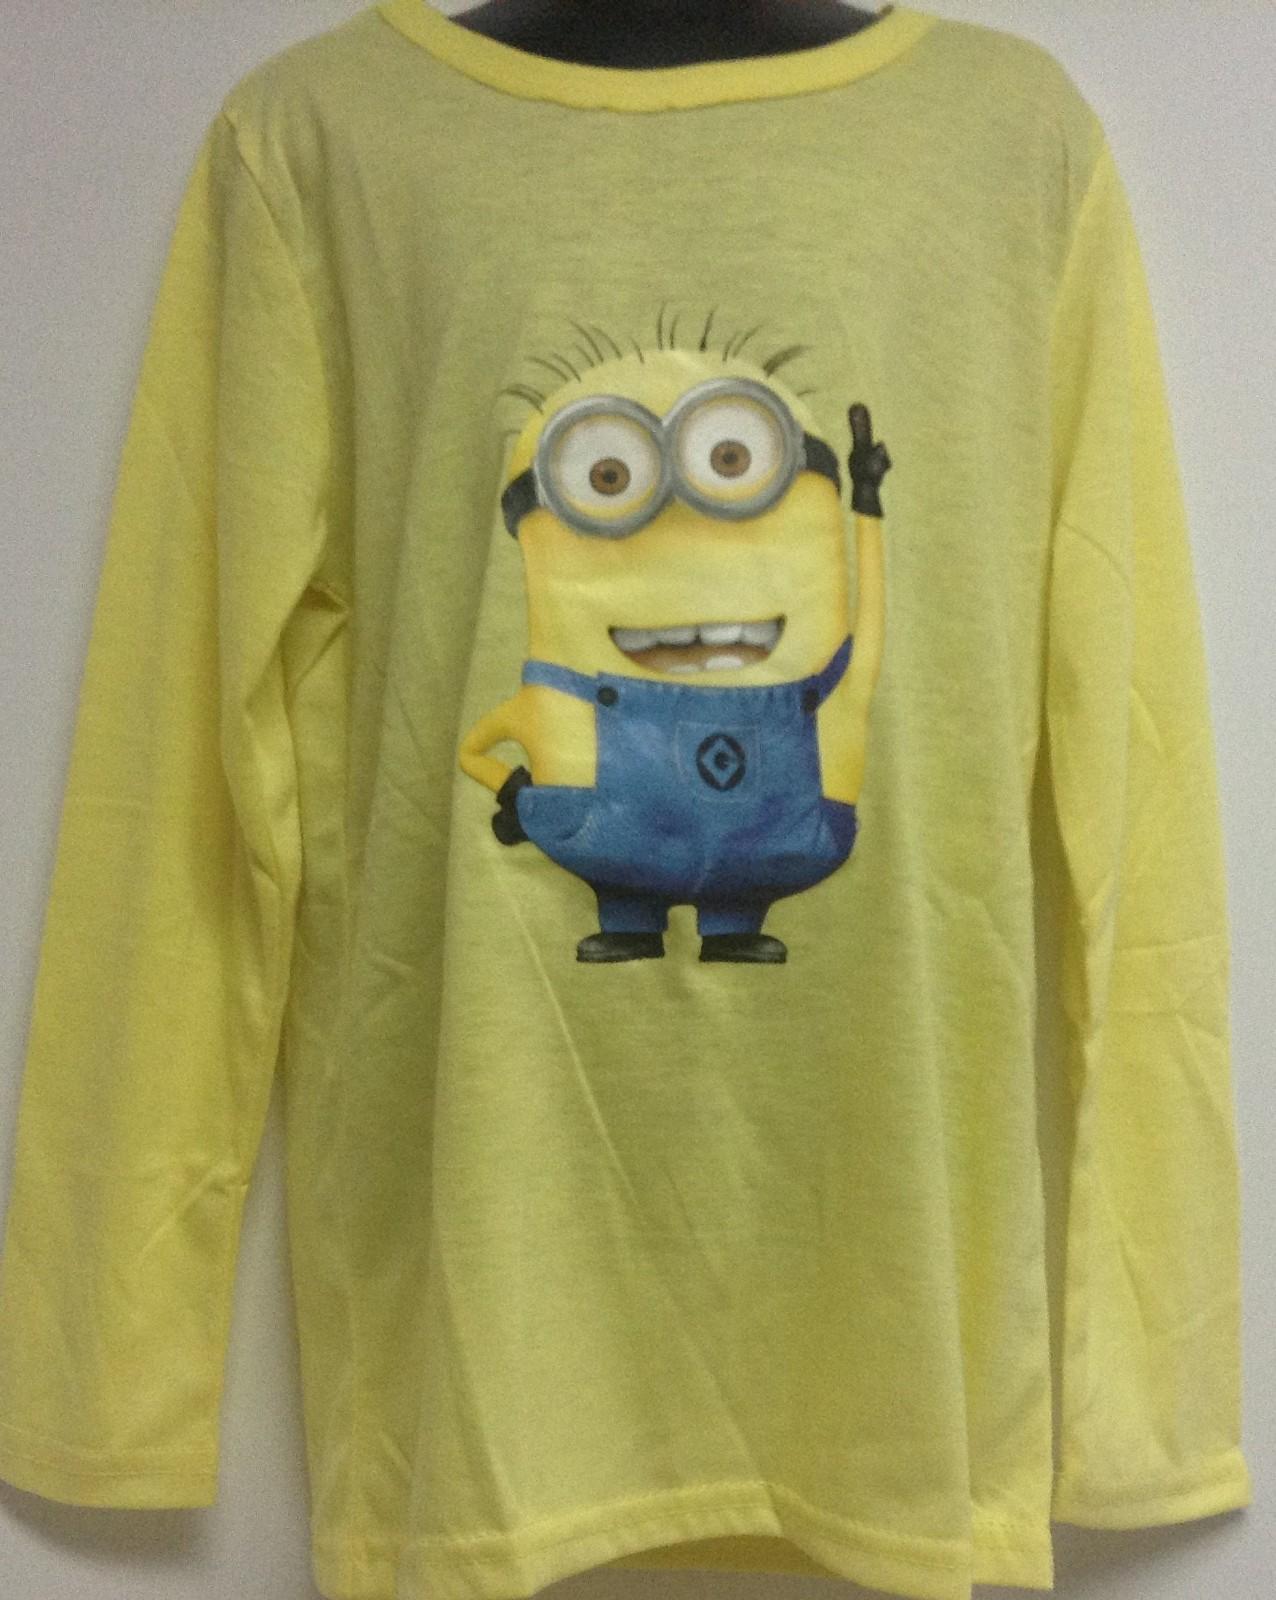 Minion Kid's Shirt Yellow Sz 8 NWT Long Sleeved